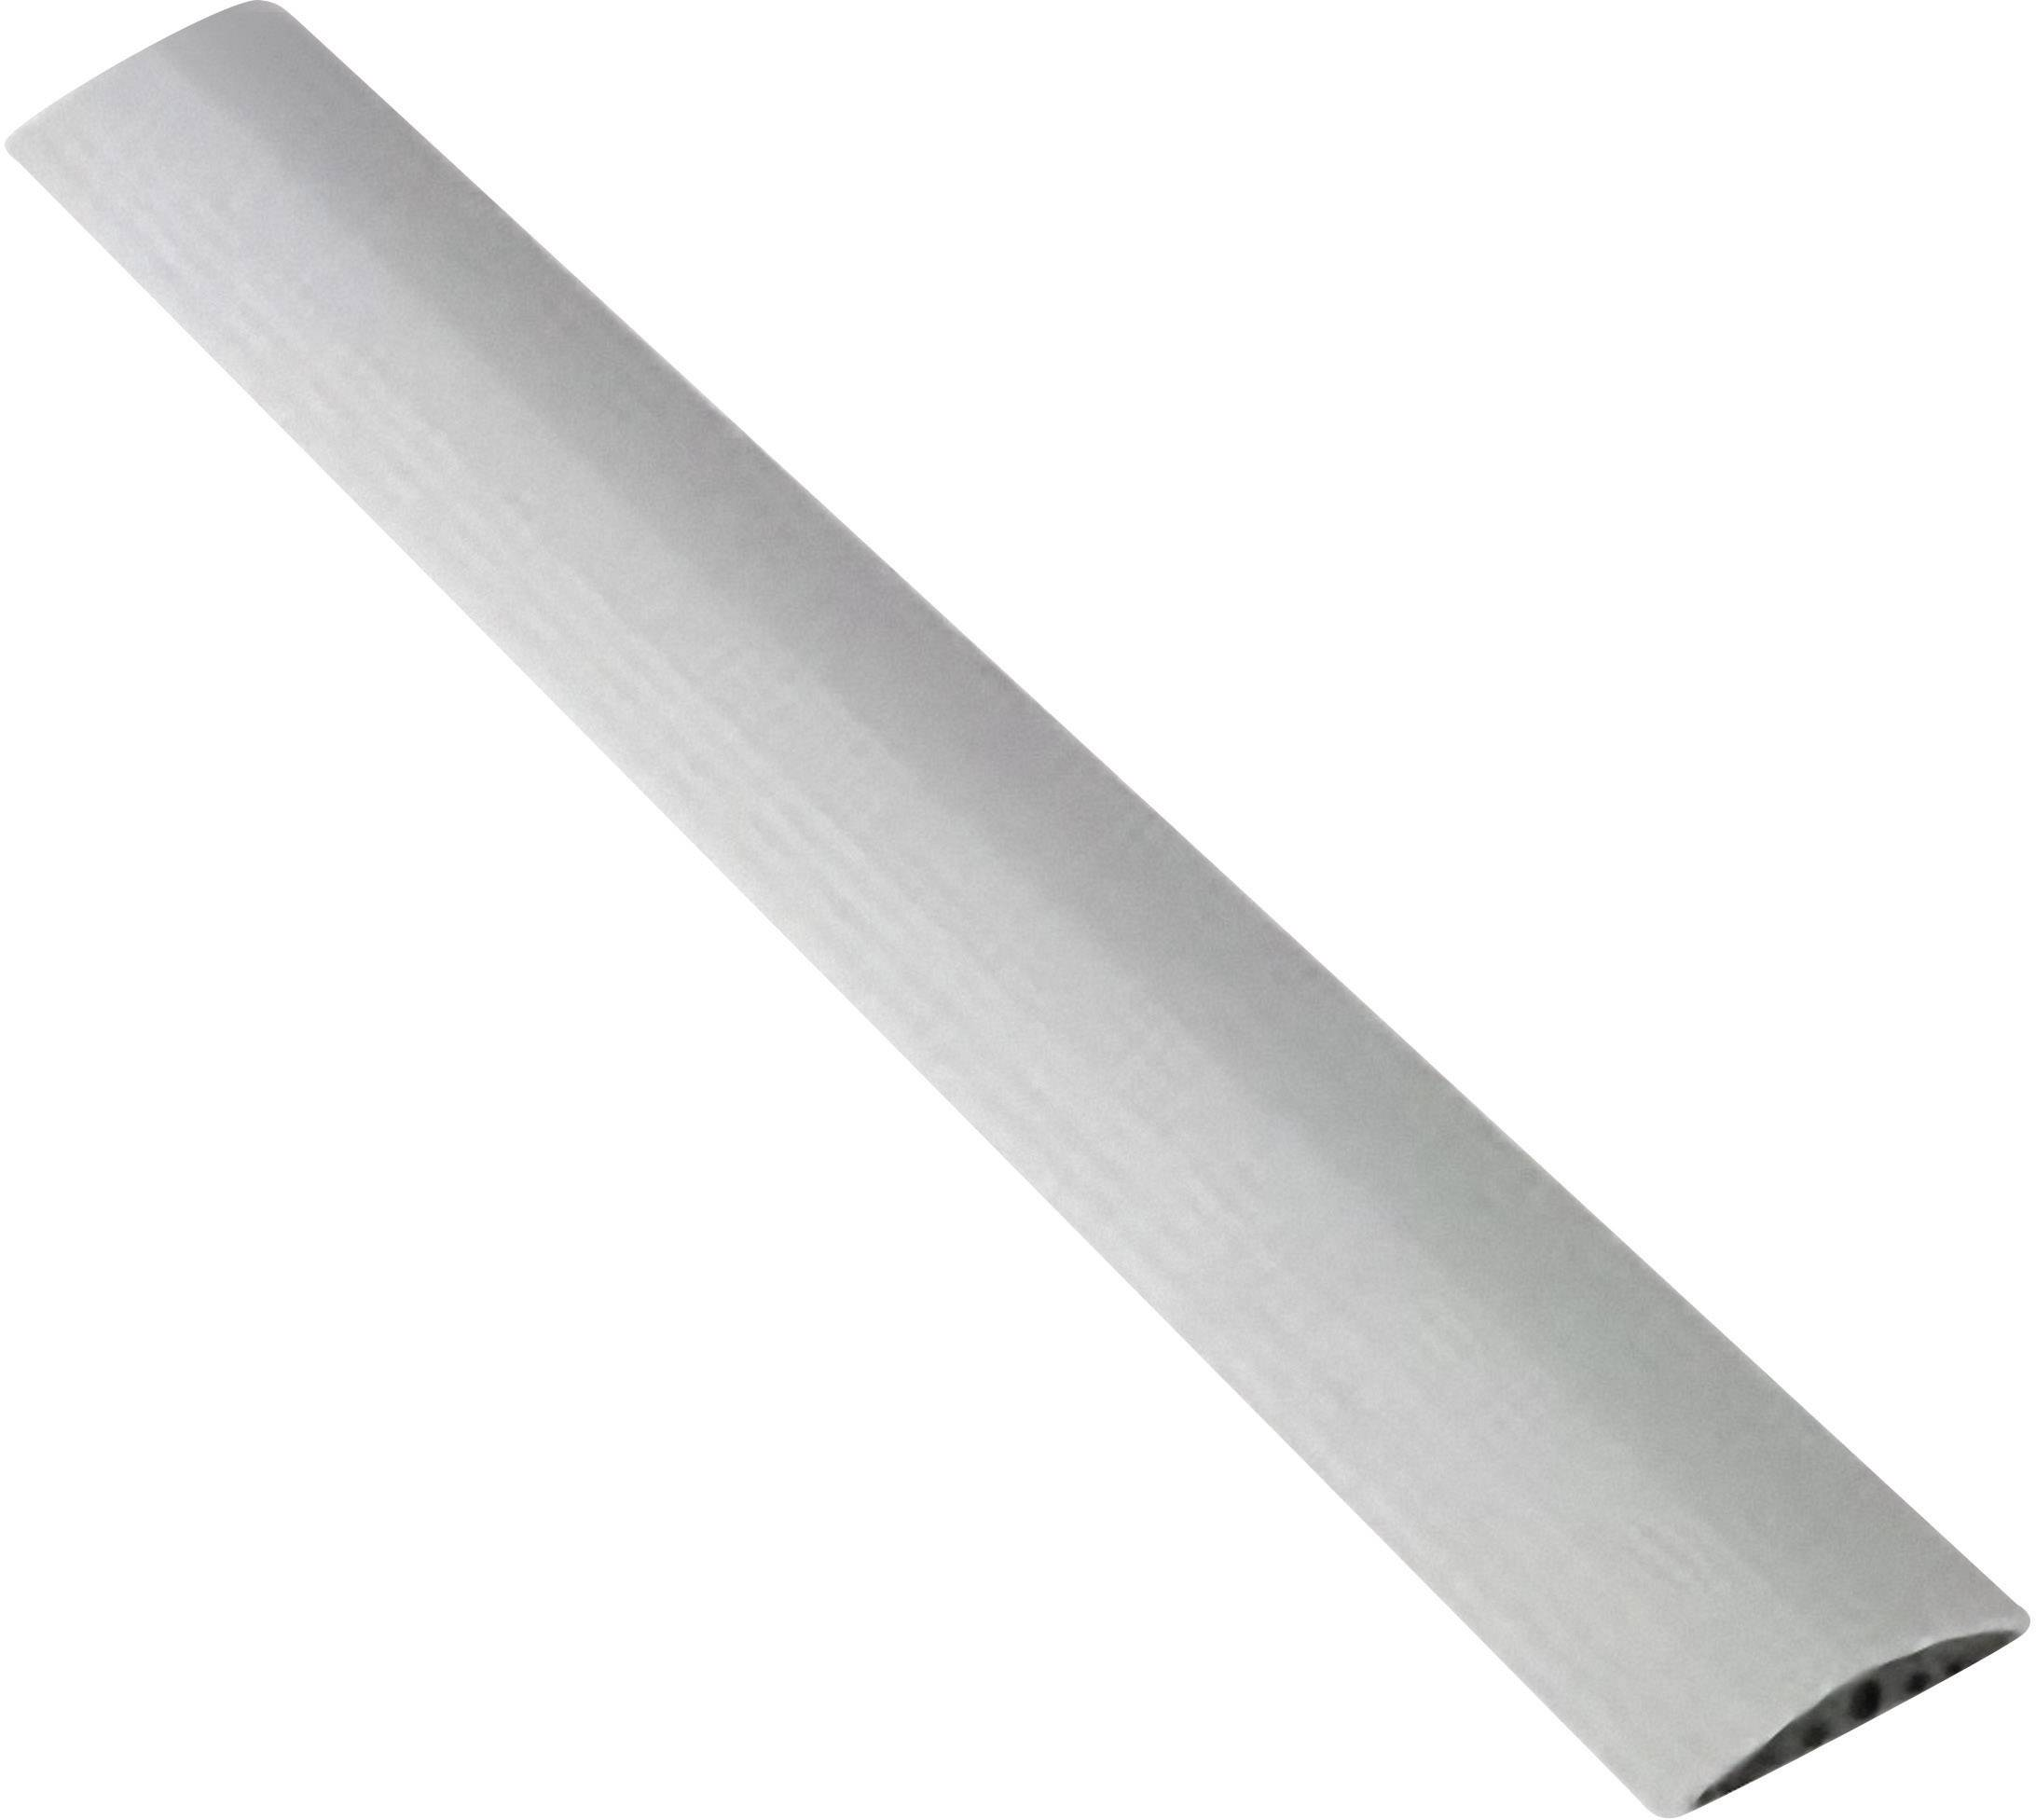 Káblový mostík Serpa 5.01022.7042 B9, (d x š) 1500 mm x 95 mm, svetlosivá, 1 ks